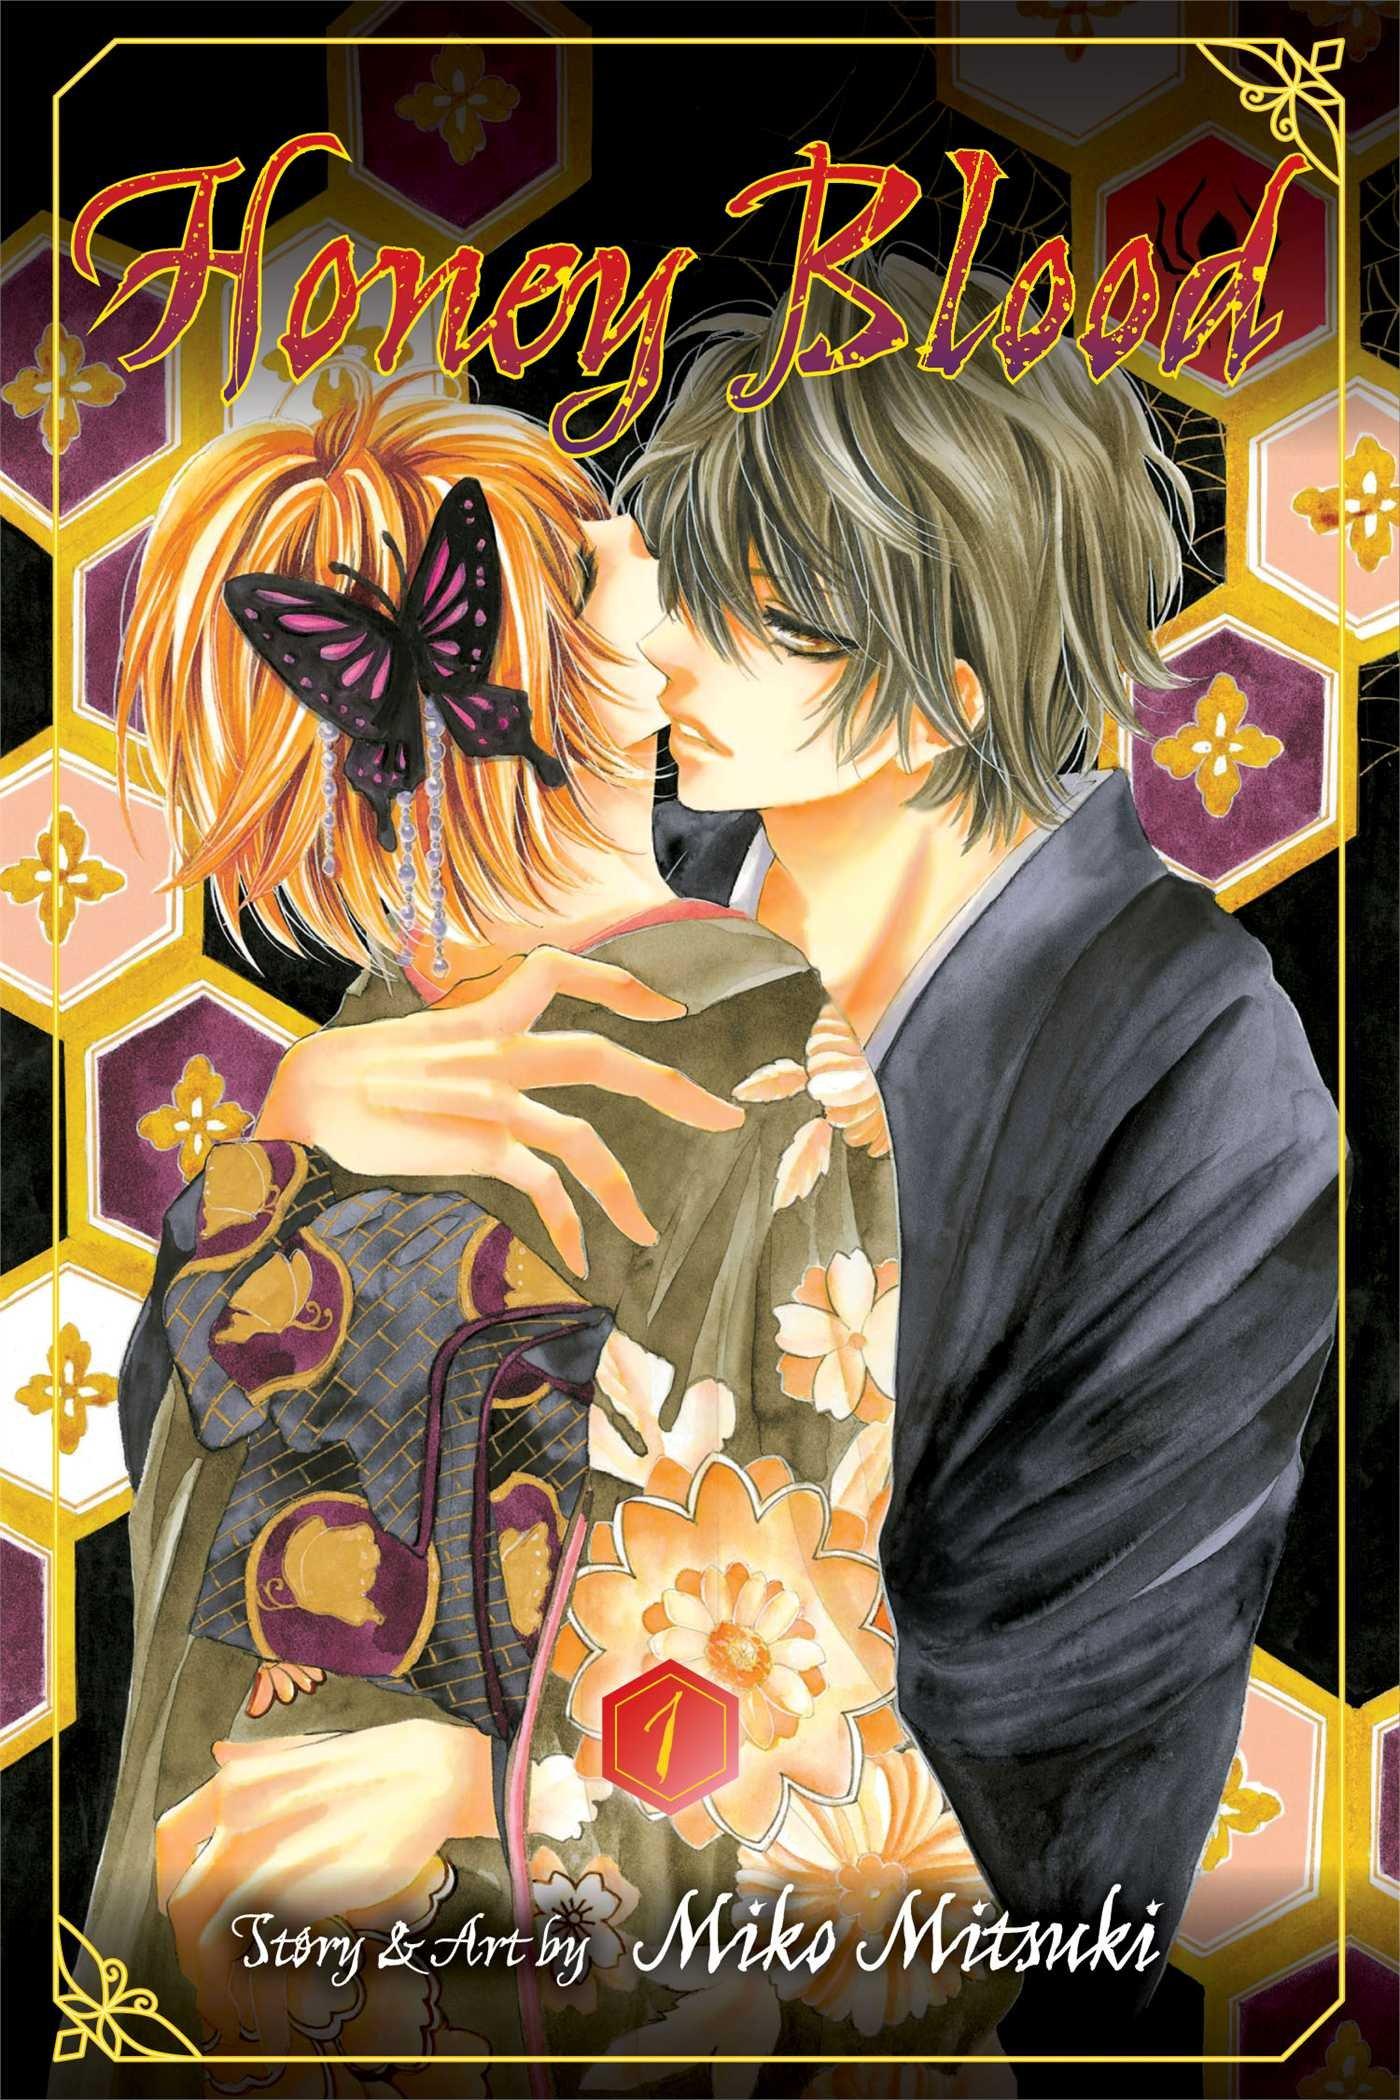 Viewing meiren_jiru'-s profile | Profiles v2 | Gaia Online